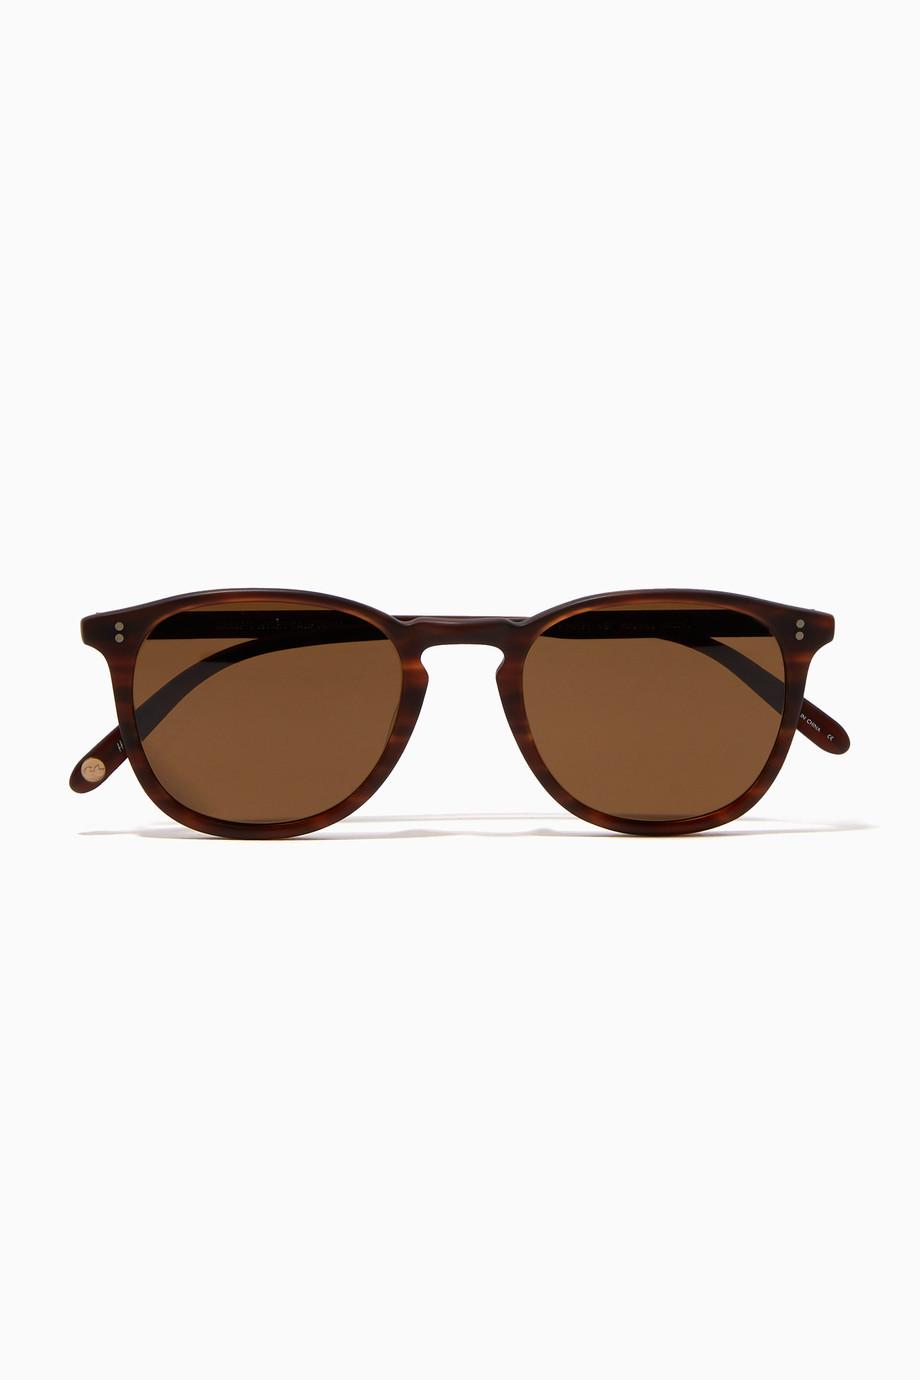 bae53fb8ace Shop Garrett Leight Brown Dark-Brown Tortoise Kinney 49 Acetate ...